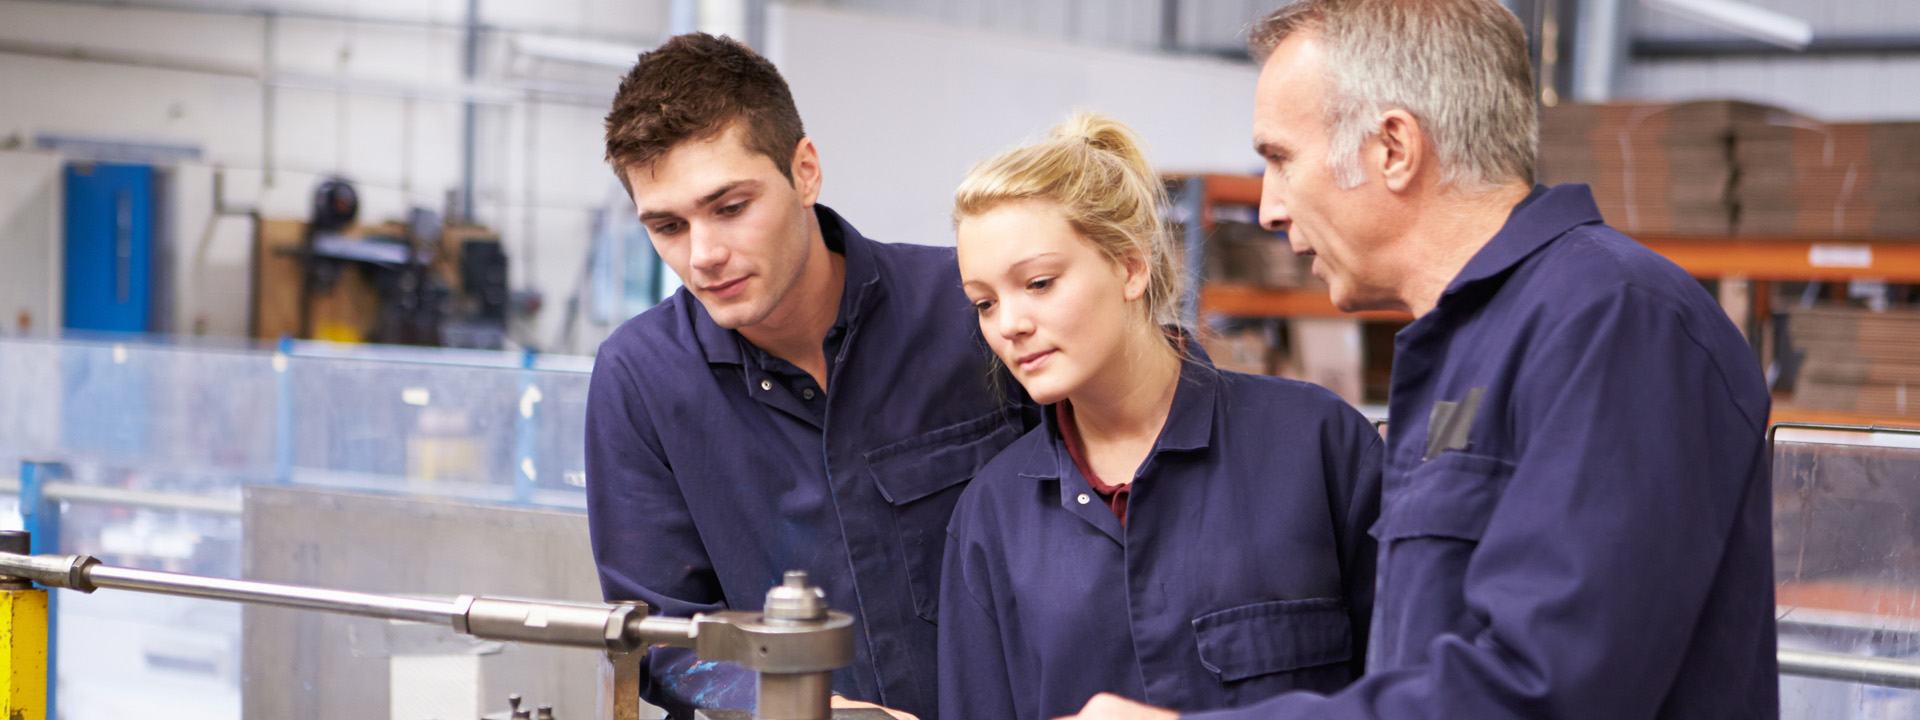 Bachelor of Construction Technology